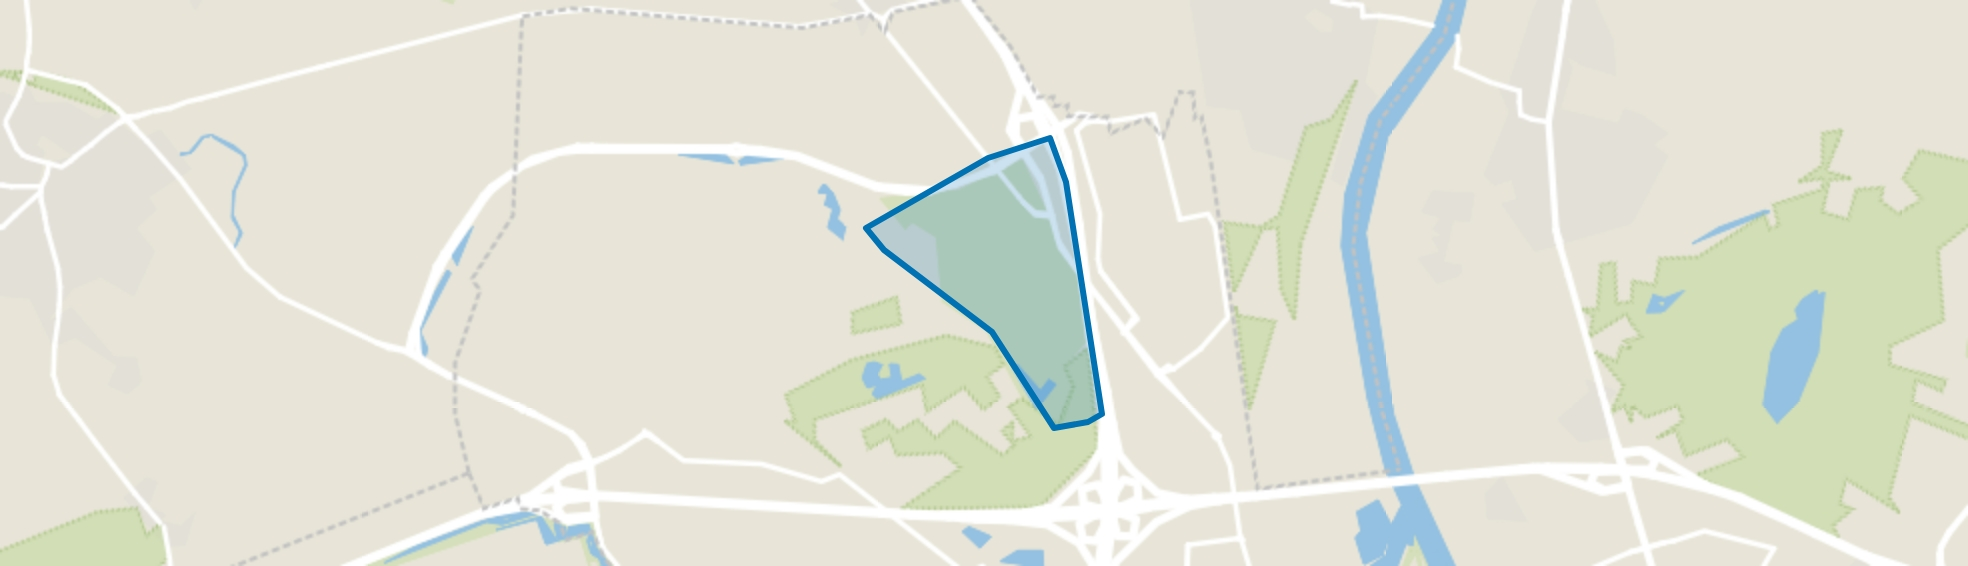 Floriade Park, Venlo map